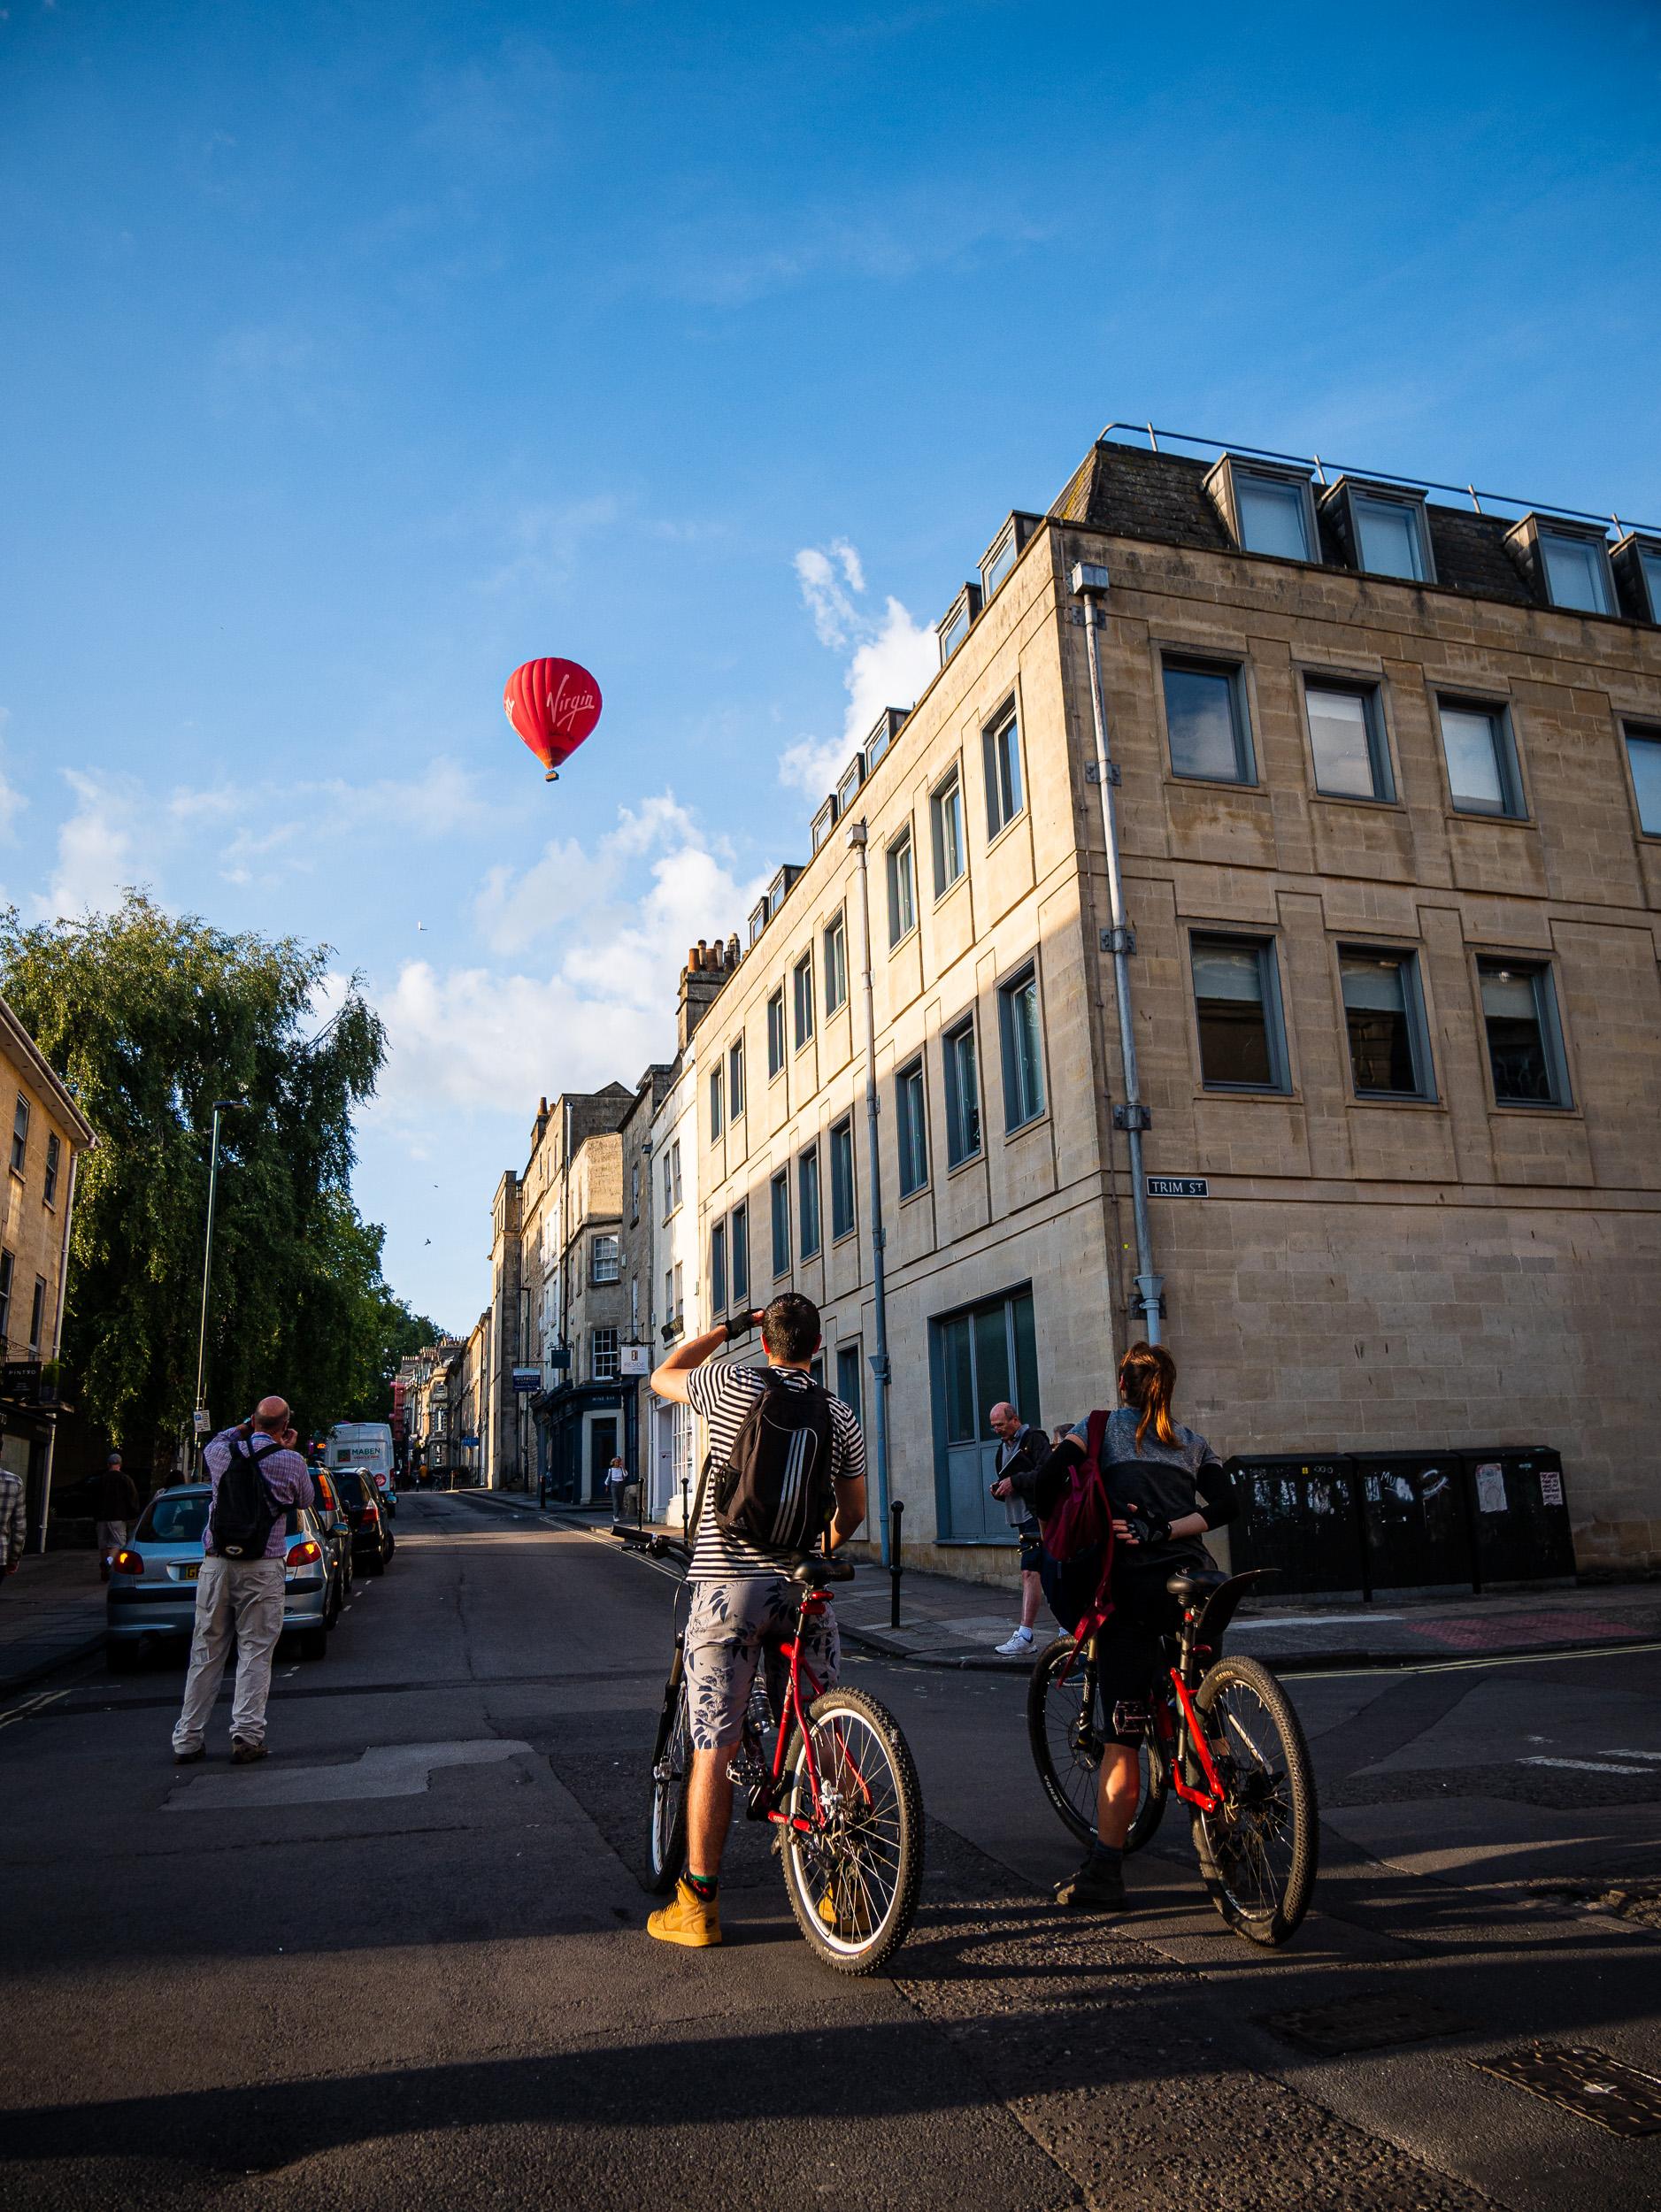 20190908-Streets of Bath #4.jpg